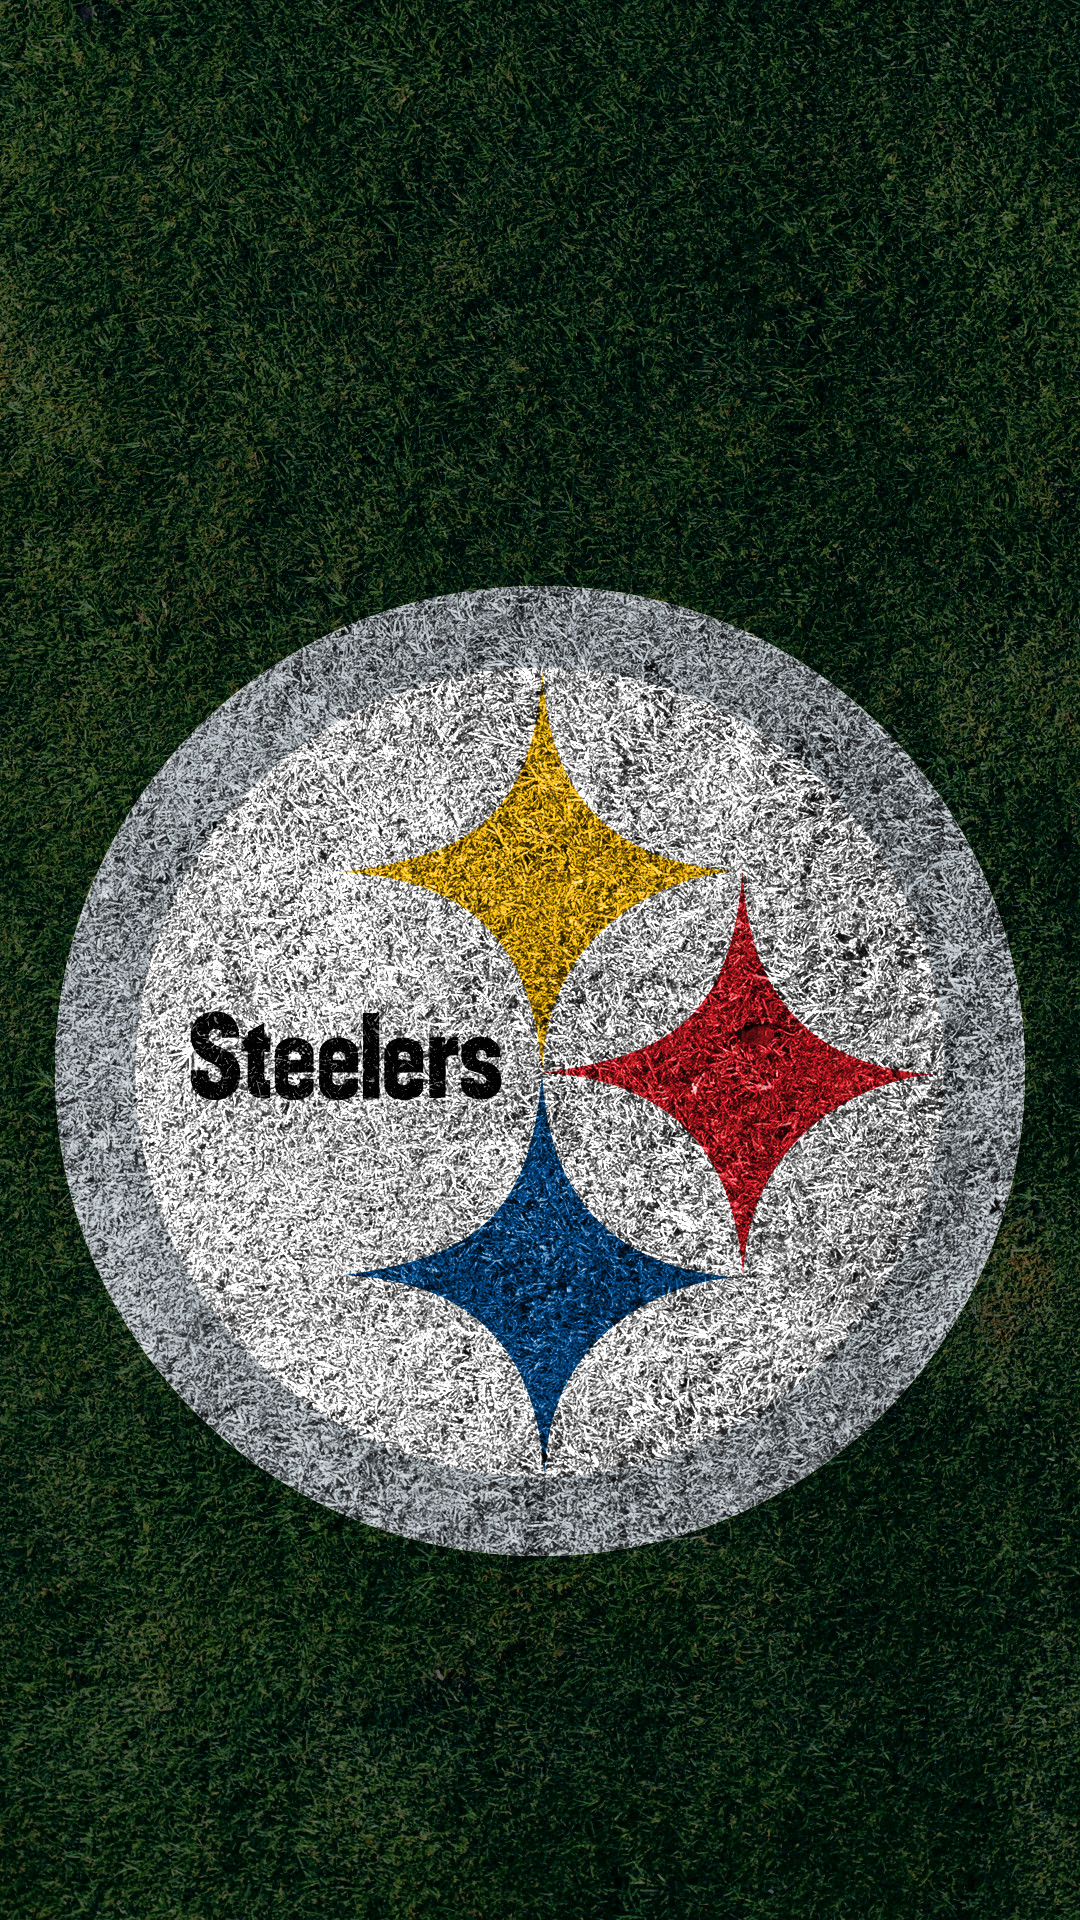 … galaxy Pittsburgh Steelers 2017 turf logo wallpaper free iphone 5, 6,  7, galaxy s6